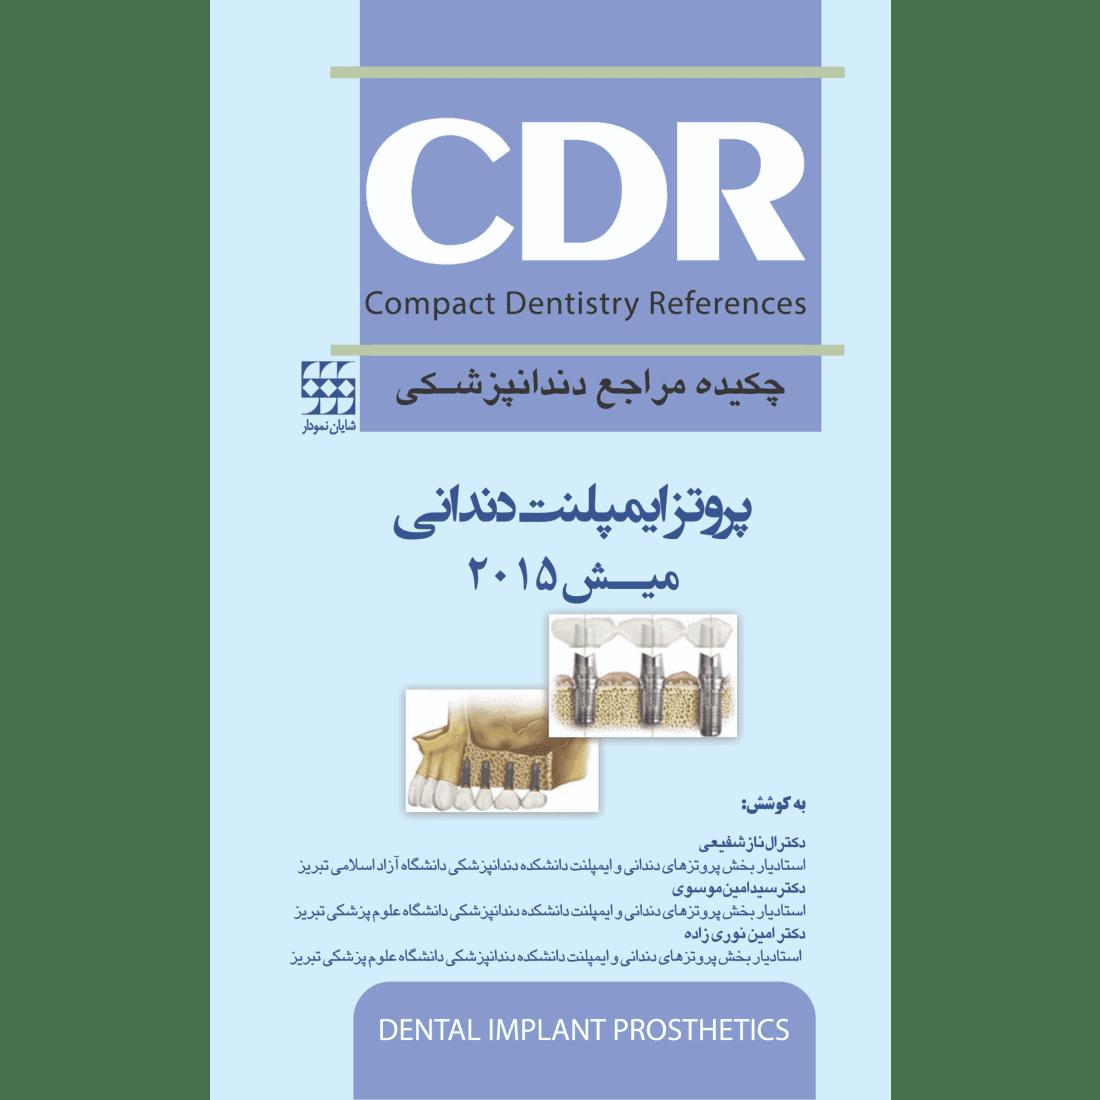 خلاصه کتاب پروتز ایمپلنت دندانی میش 2016 CDR